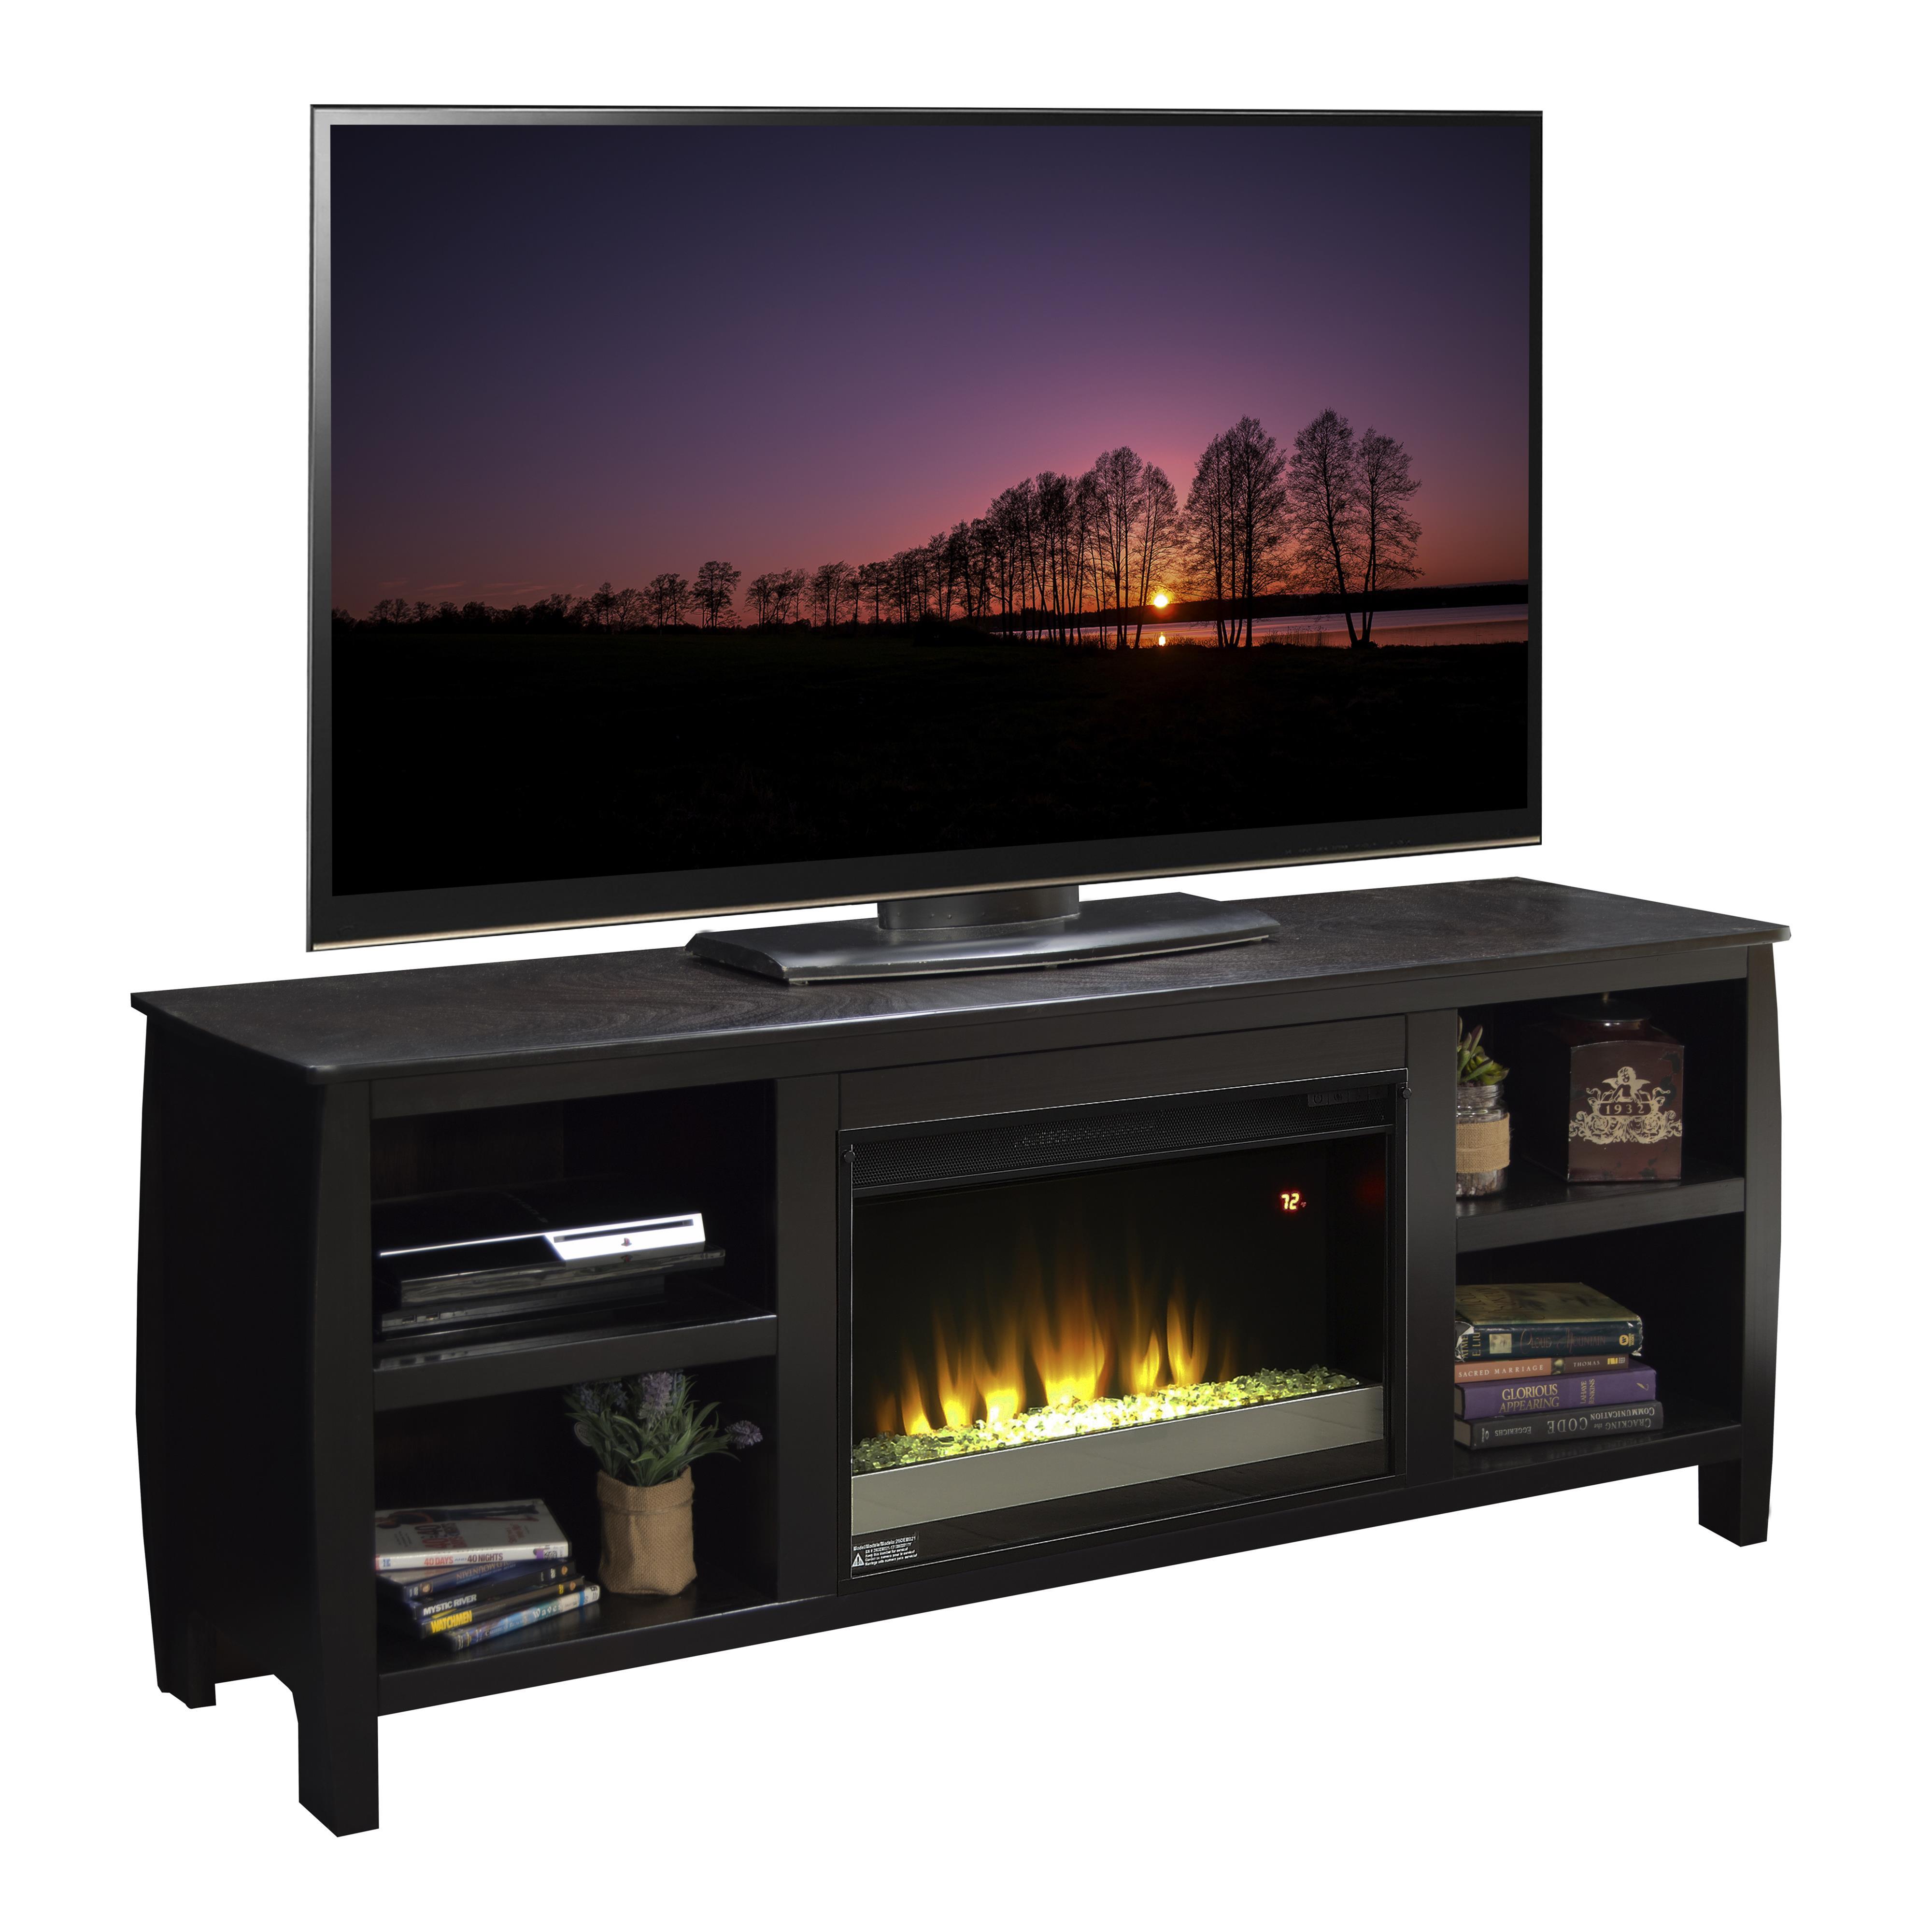 "Legends Furniture The Curve 69"" Fireplace TV Console - Item Number: CV5230.KIT"